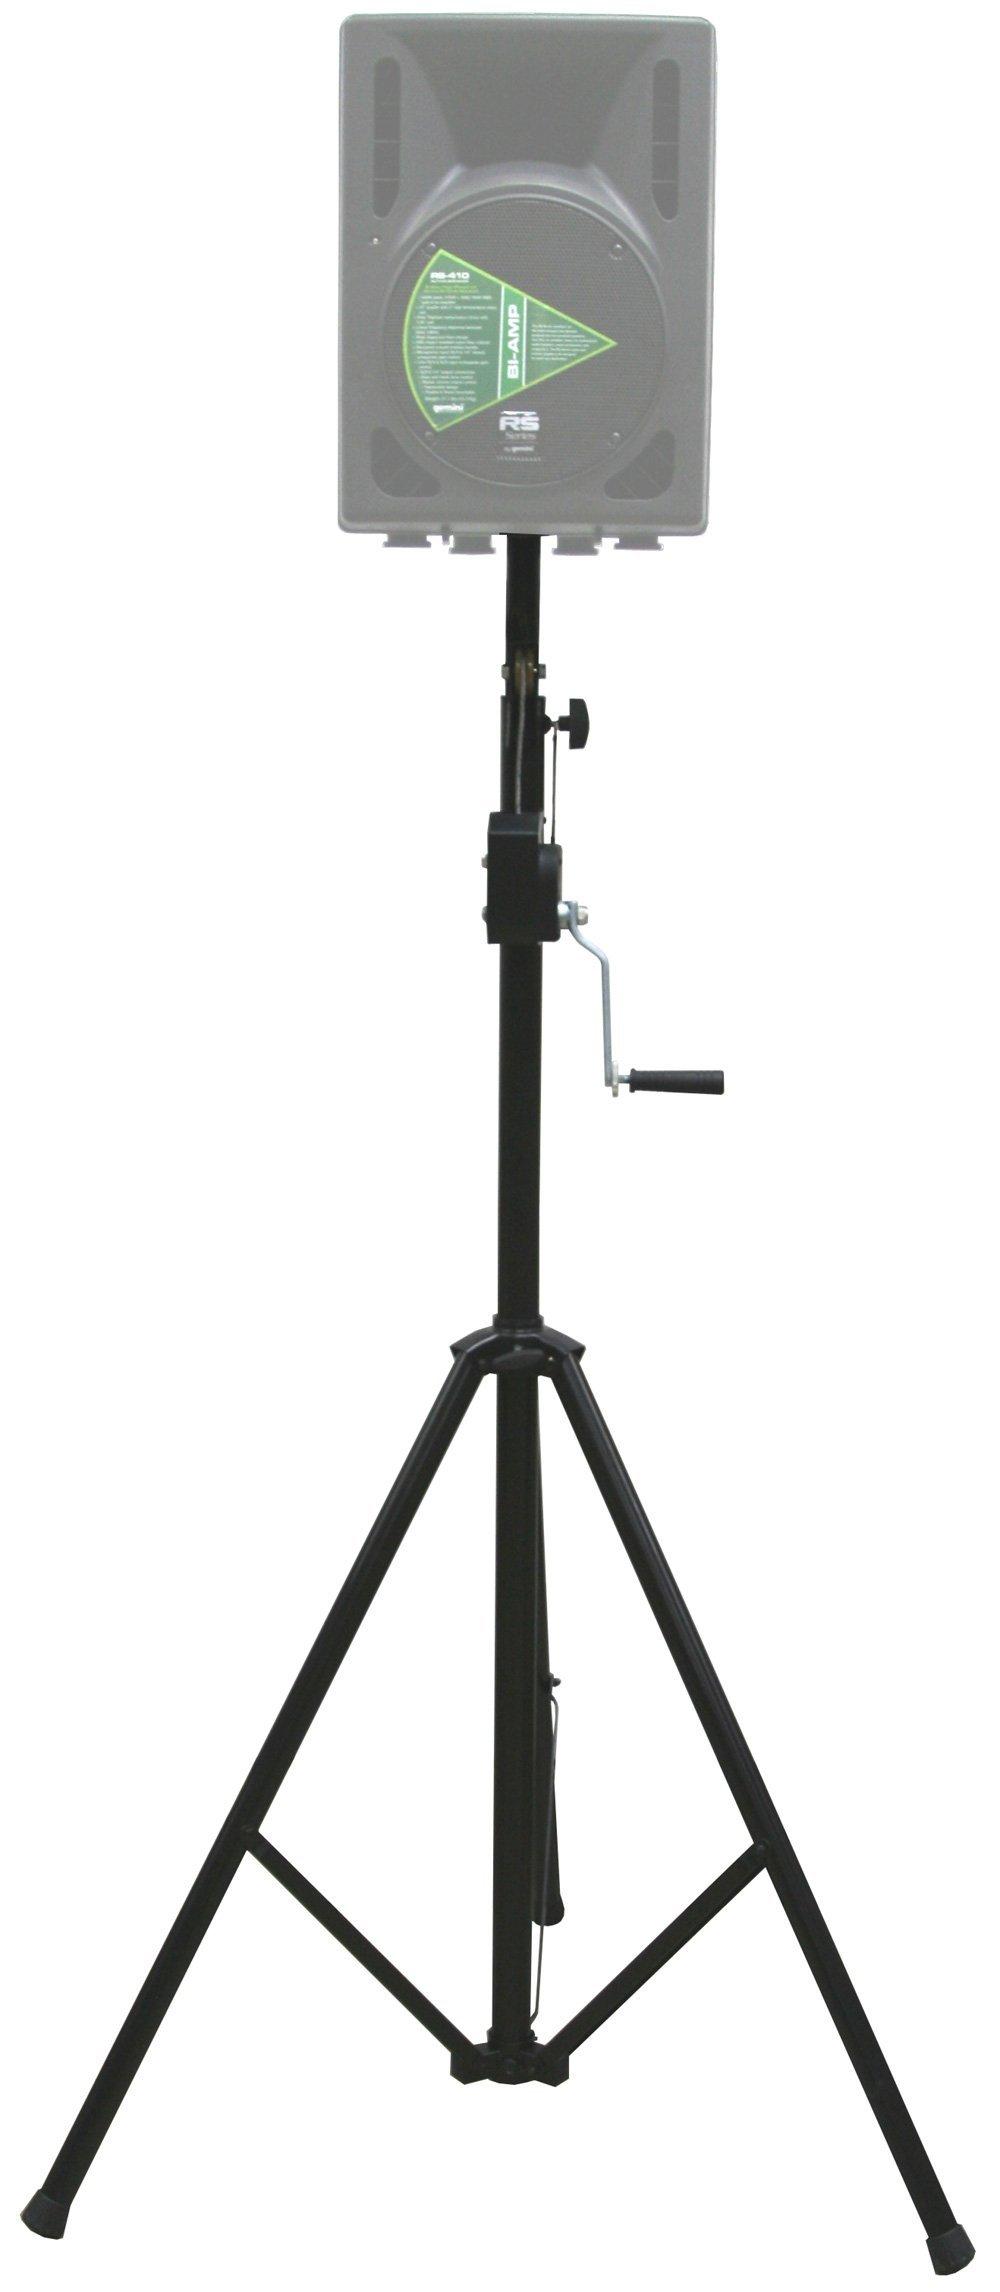 ASC Pro Audio Mobile DJ Light Stand 10 Foot Height Crank Lighting or Speaker Tripod